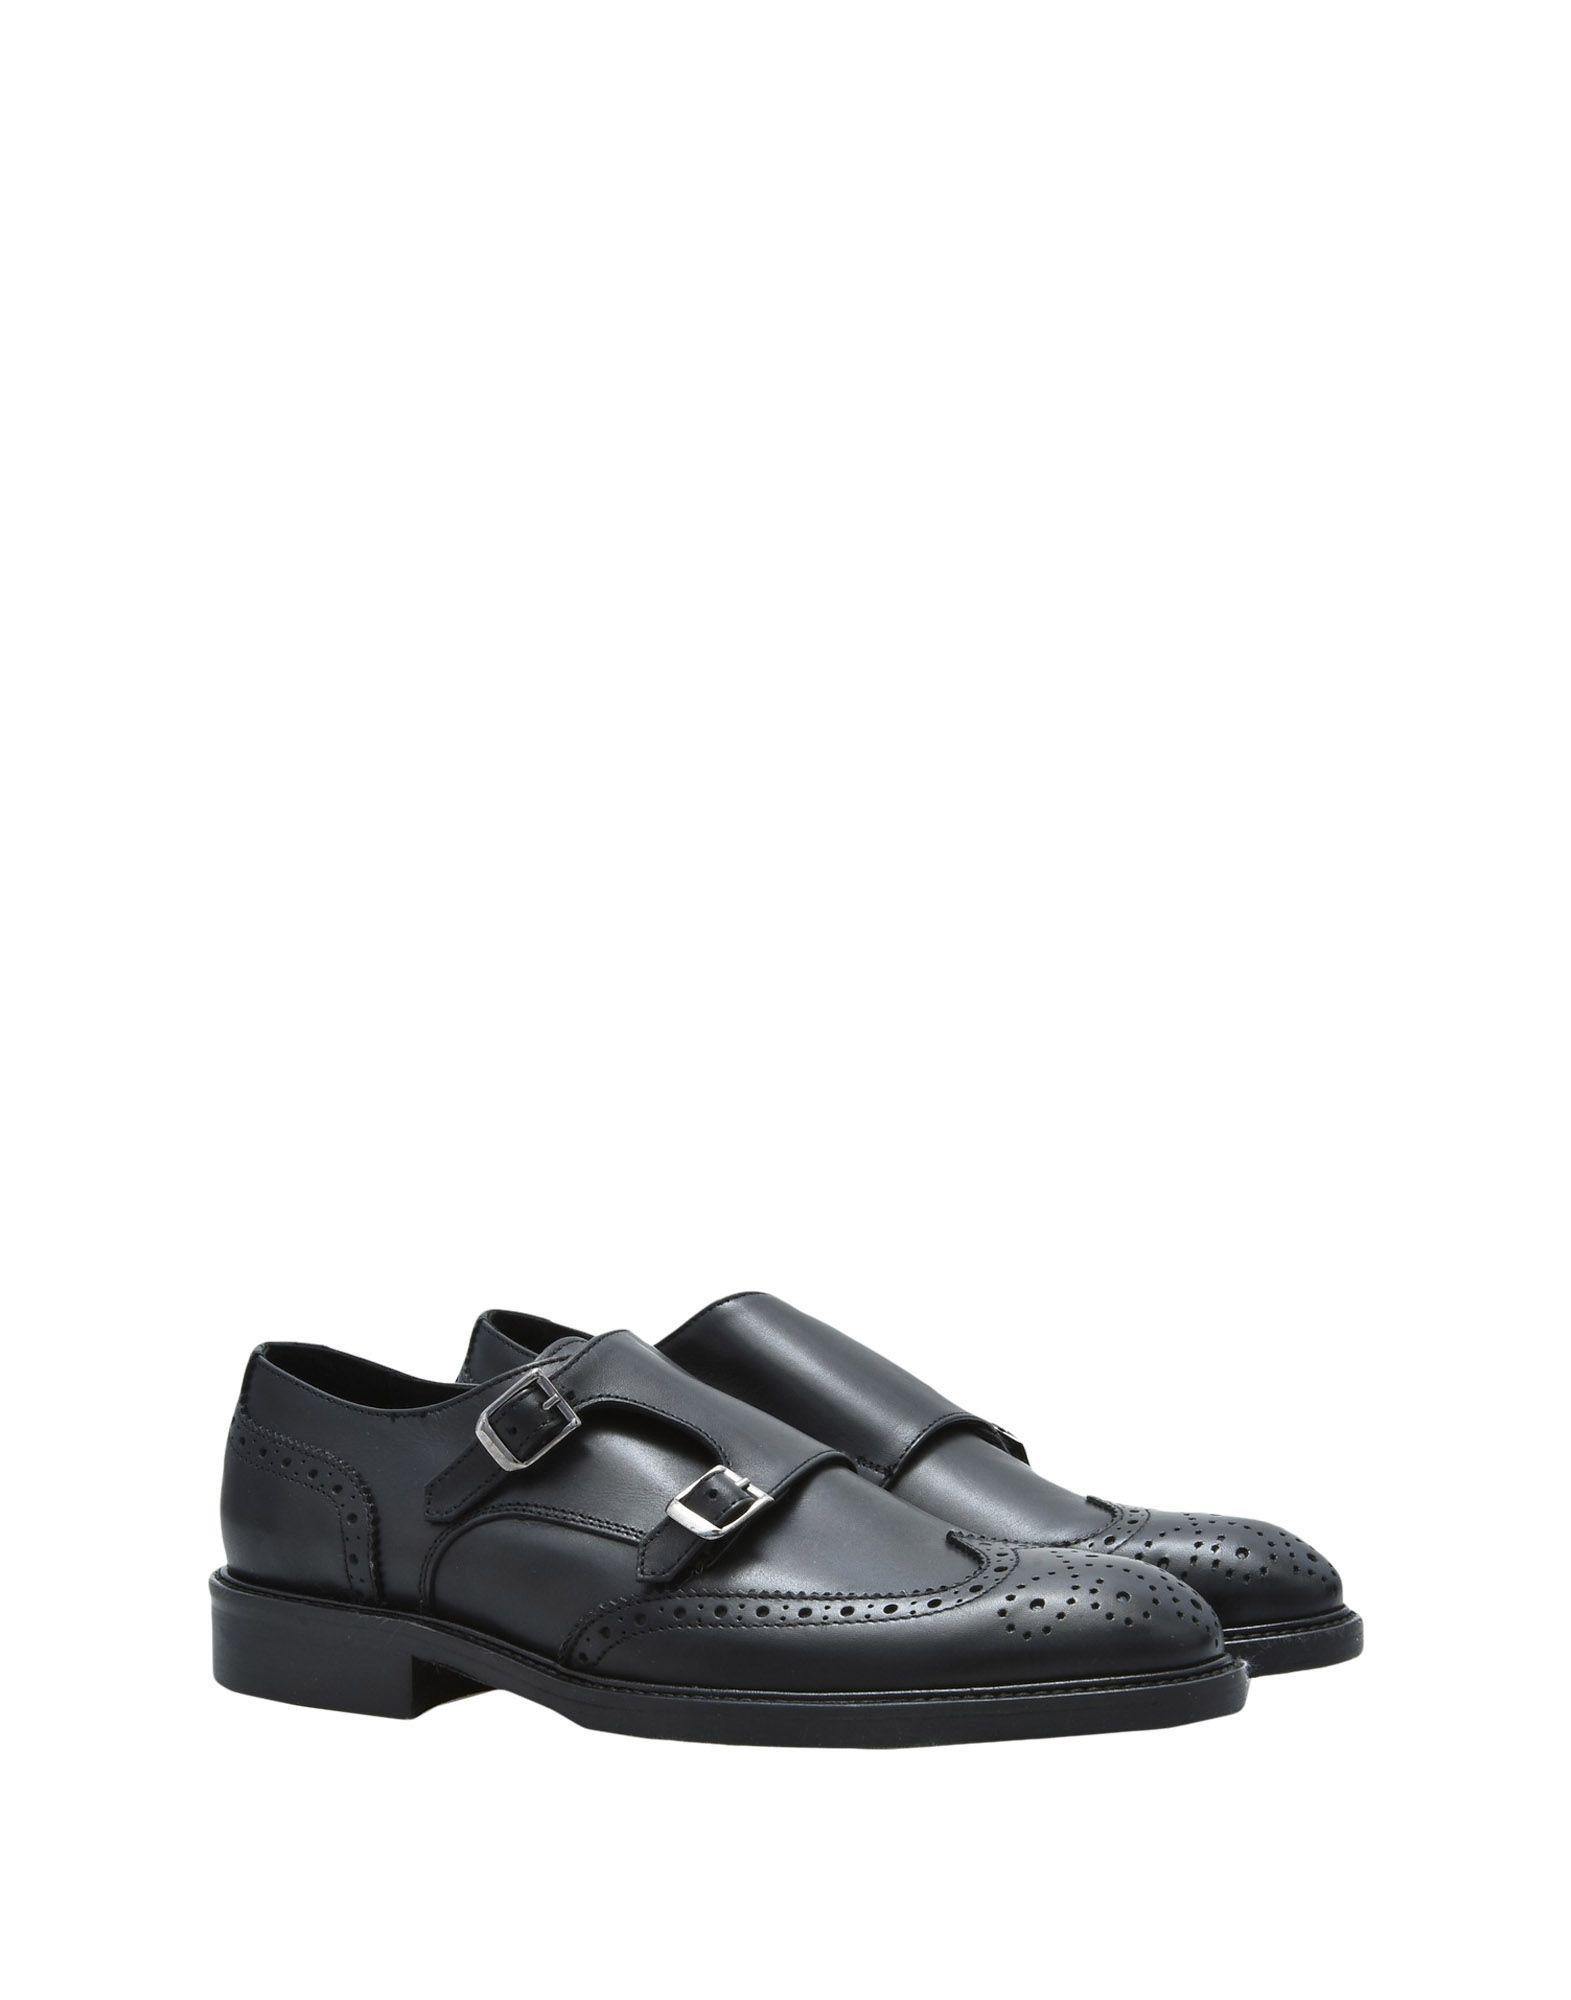 Rabatt echte Schuhe Marfé Le Officine Marfé Schuhe Mokassins Herren 11508702BO 722b22